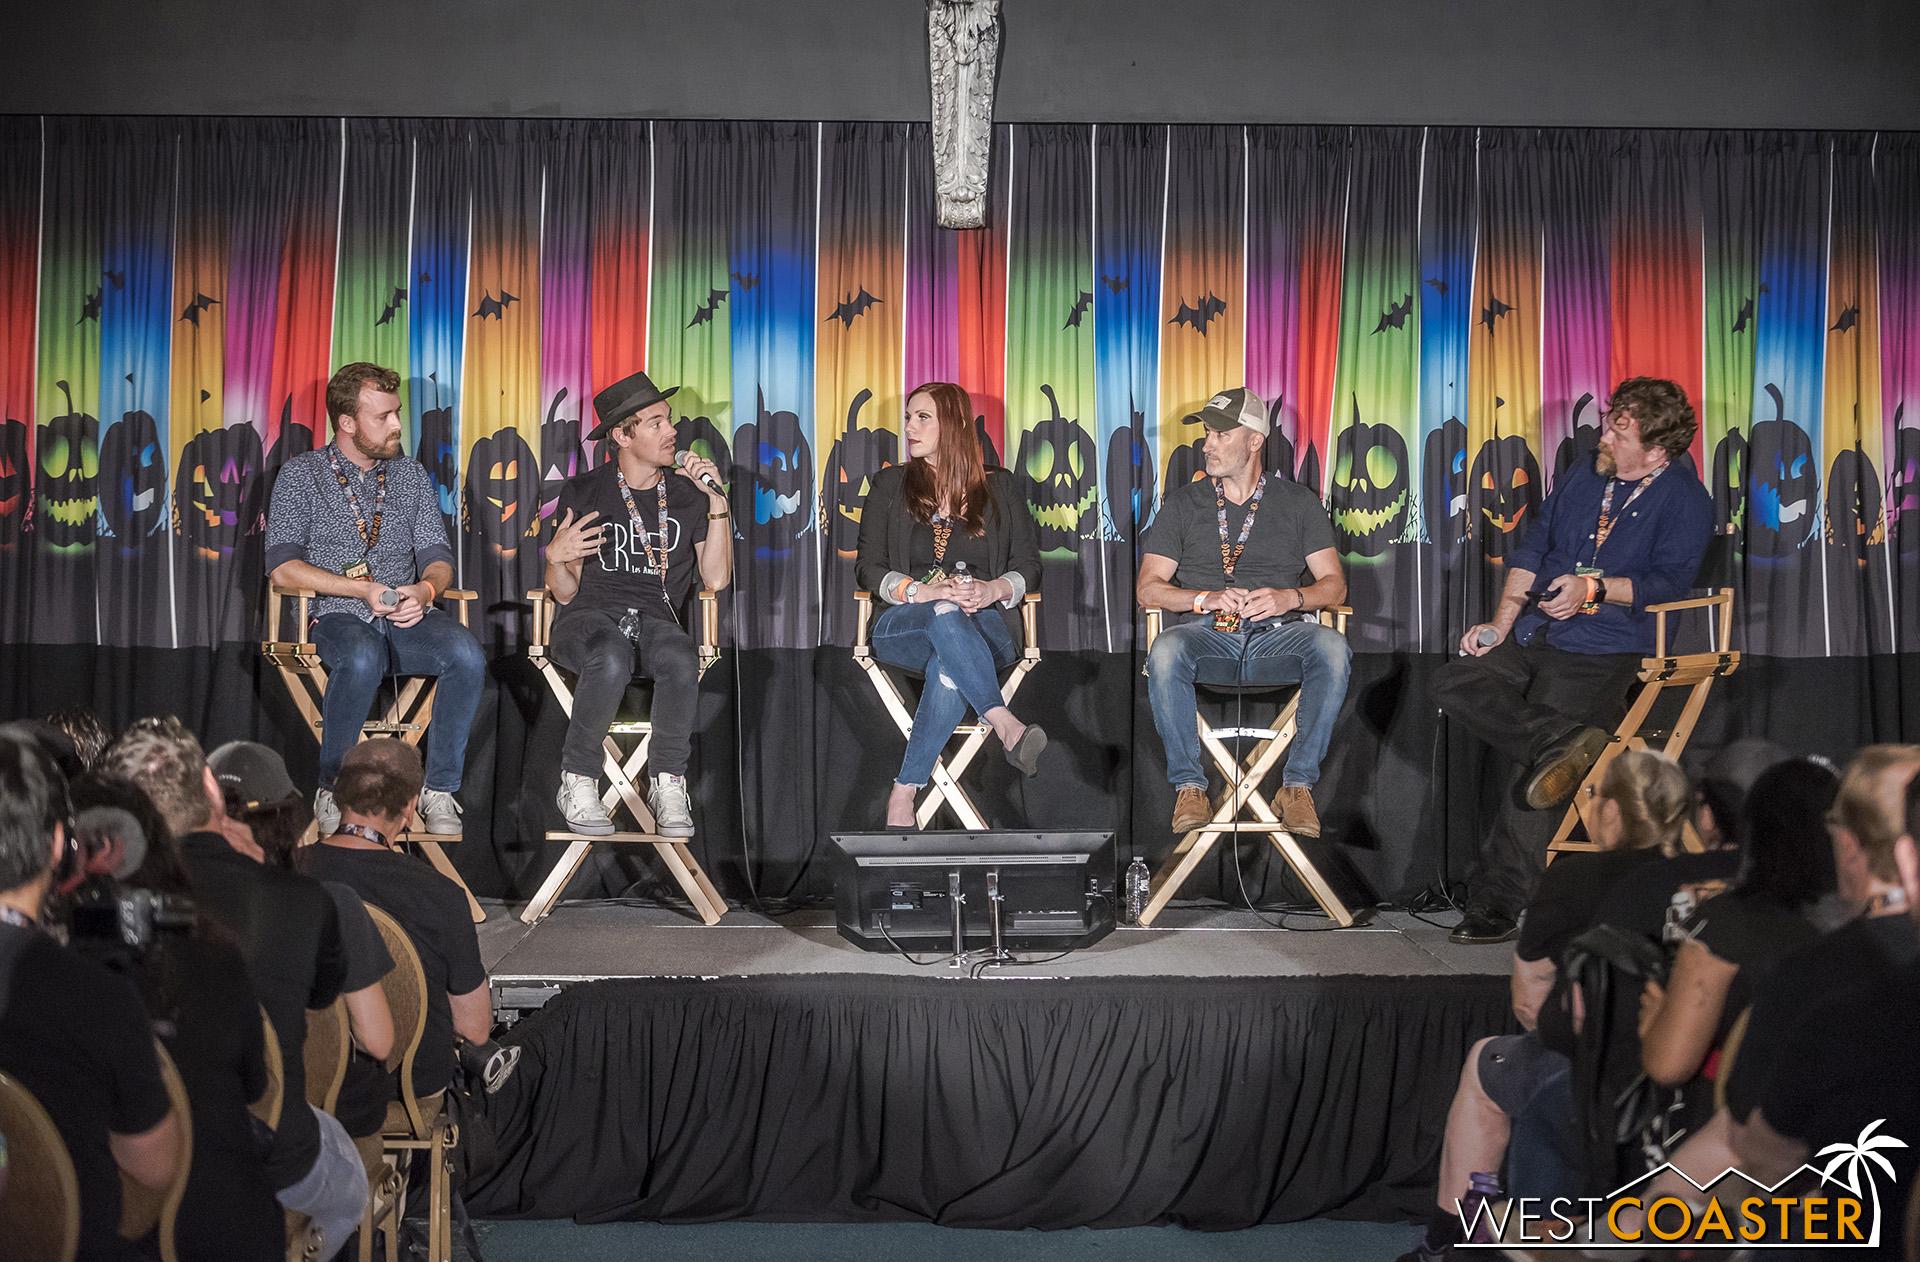 Left to right: Aaron Keeling, Justin Fix, Bonnie Hallman, Jon Braver, and moderator Noah Nelson.